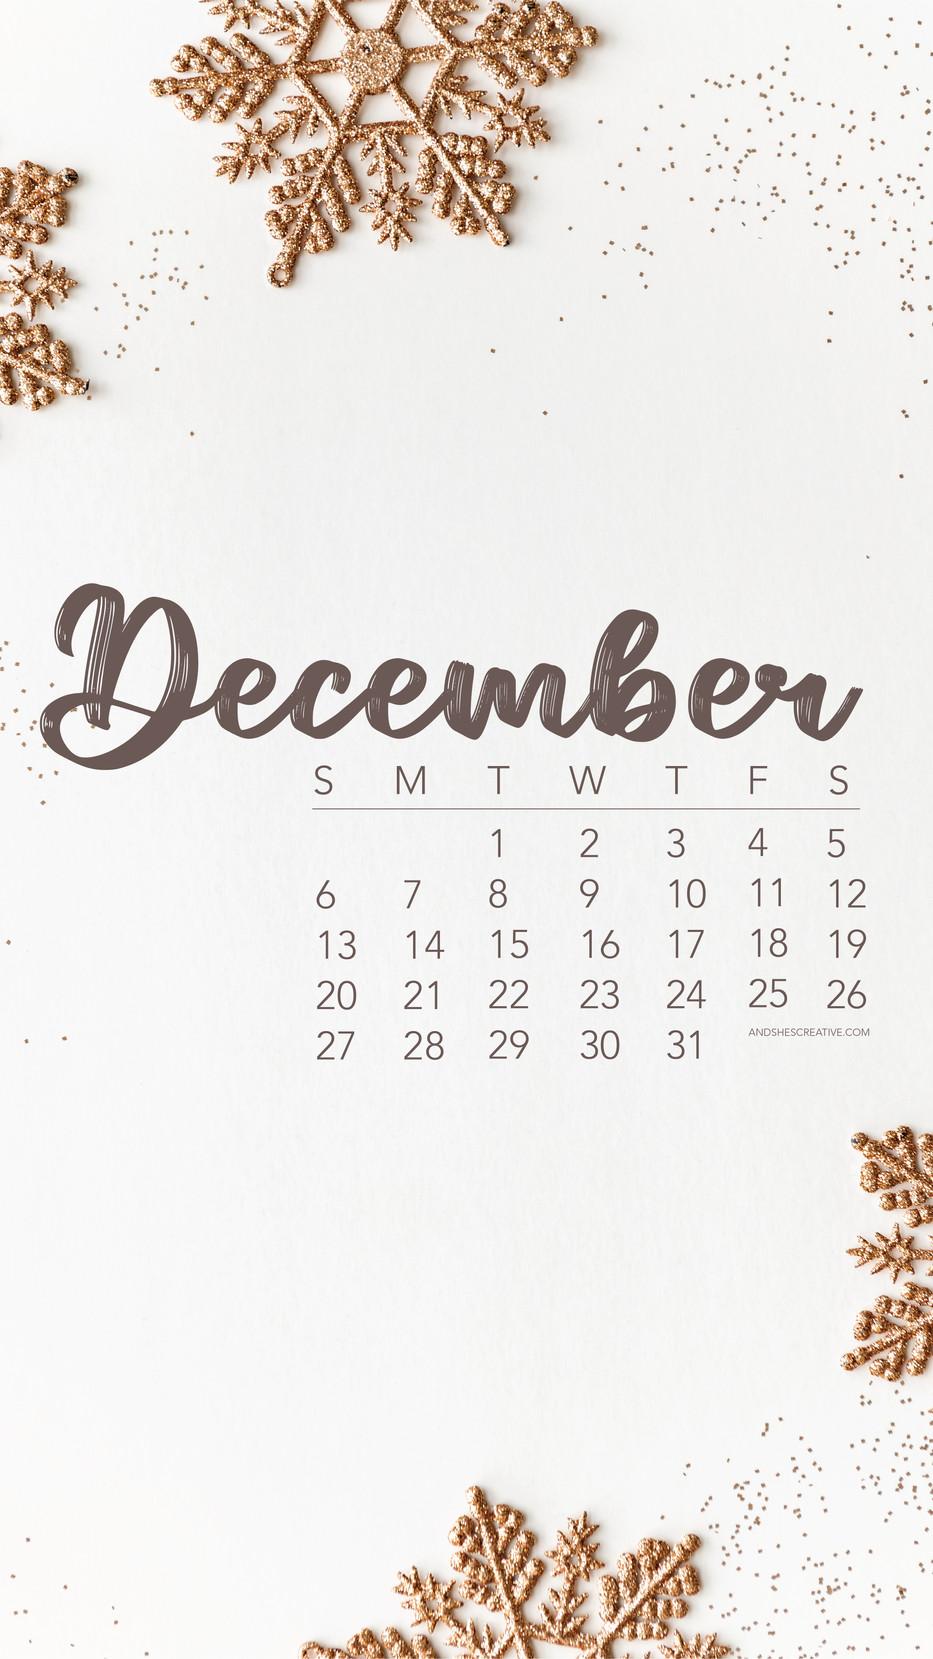 December Snowflake Calendar Mobile Background